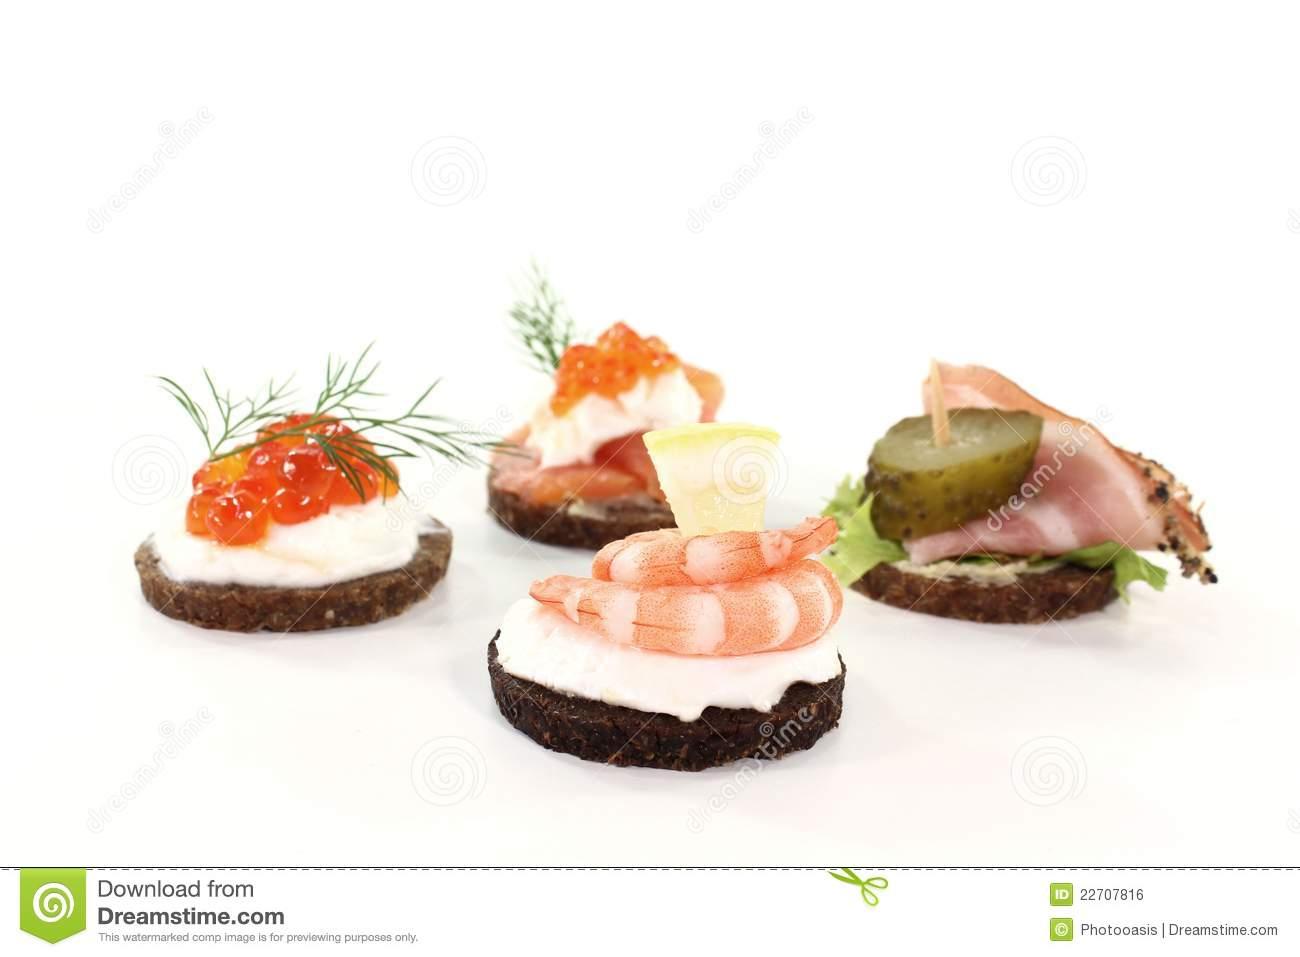 Appetizers clipart canape. Shrimp hors d oeuvres